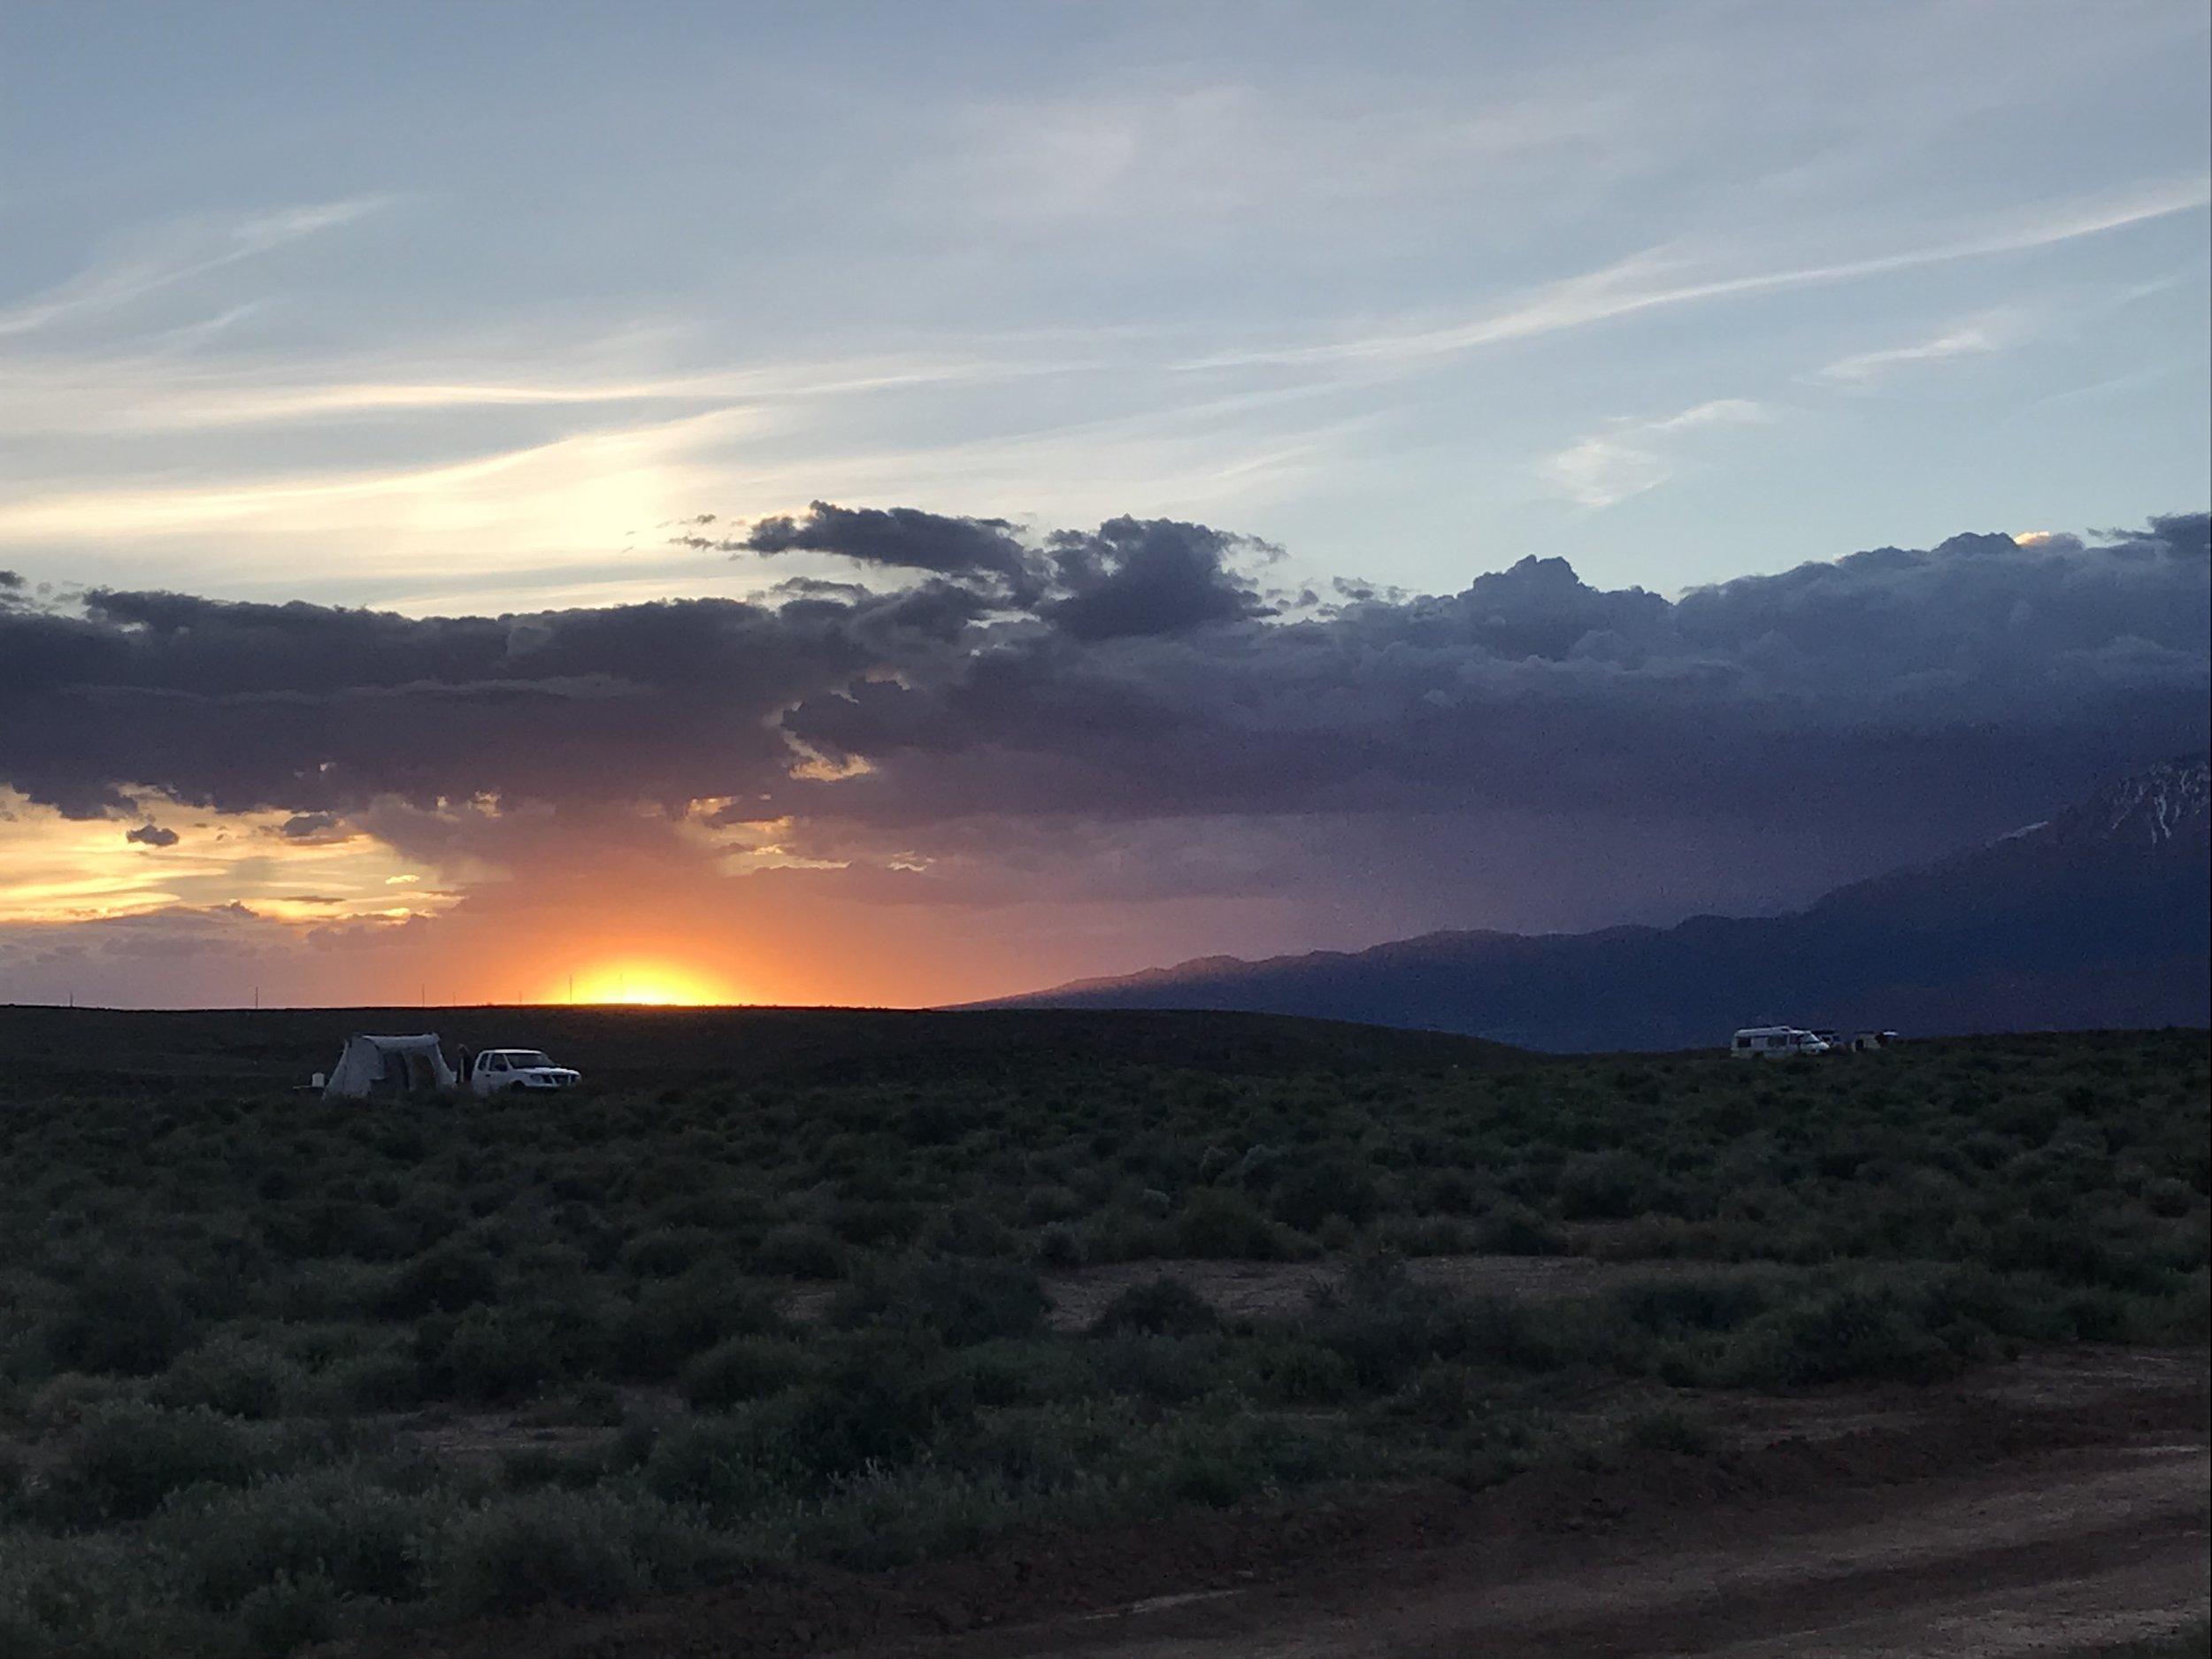 One last sunset.